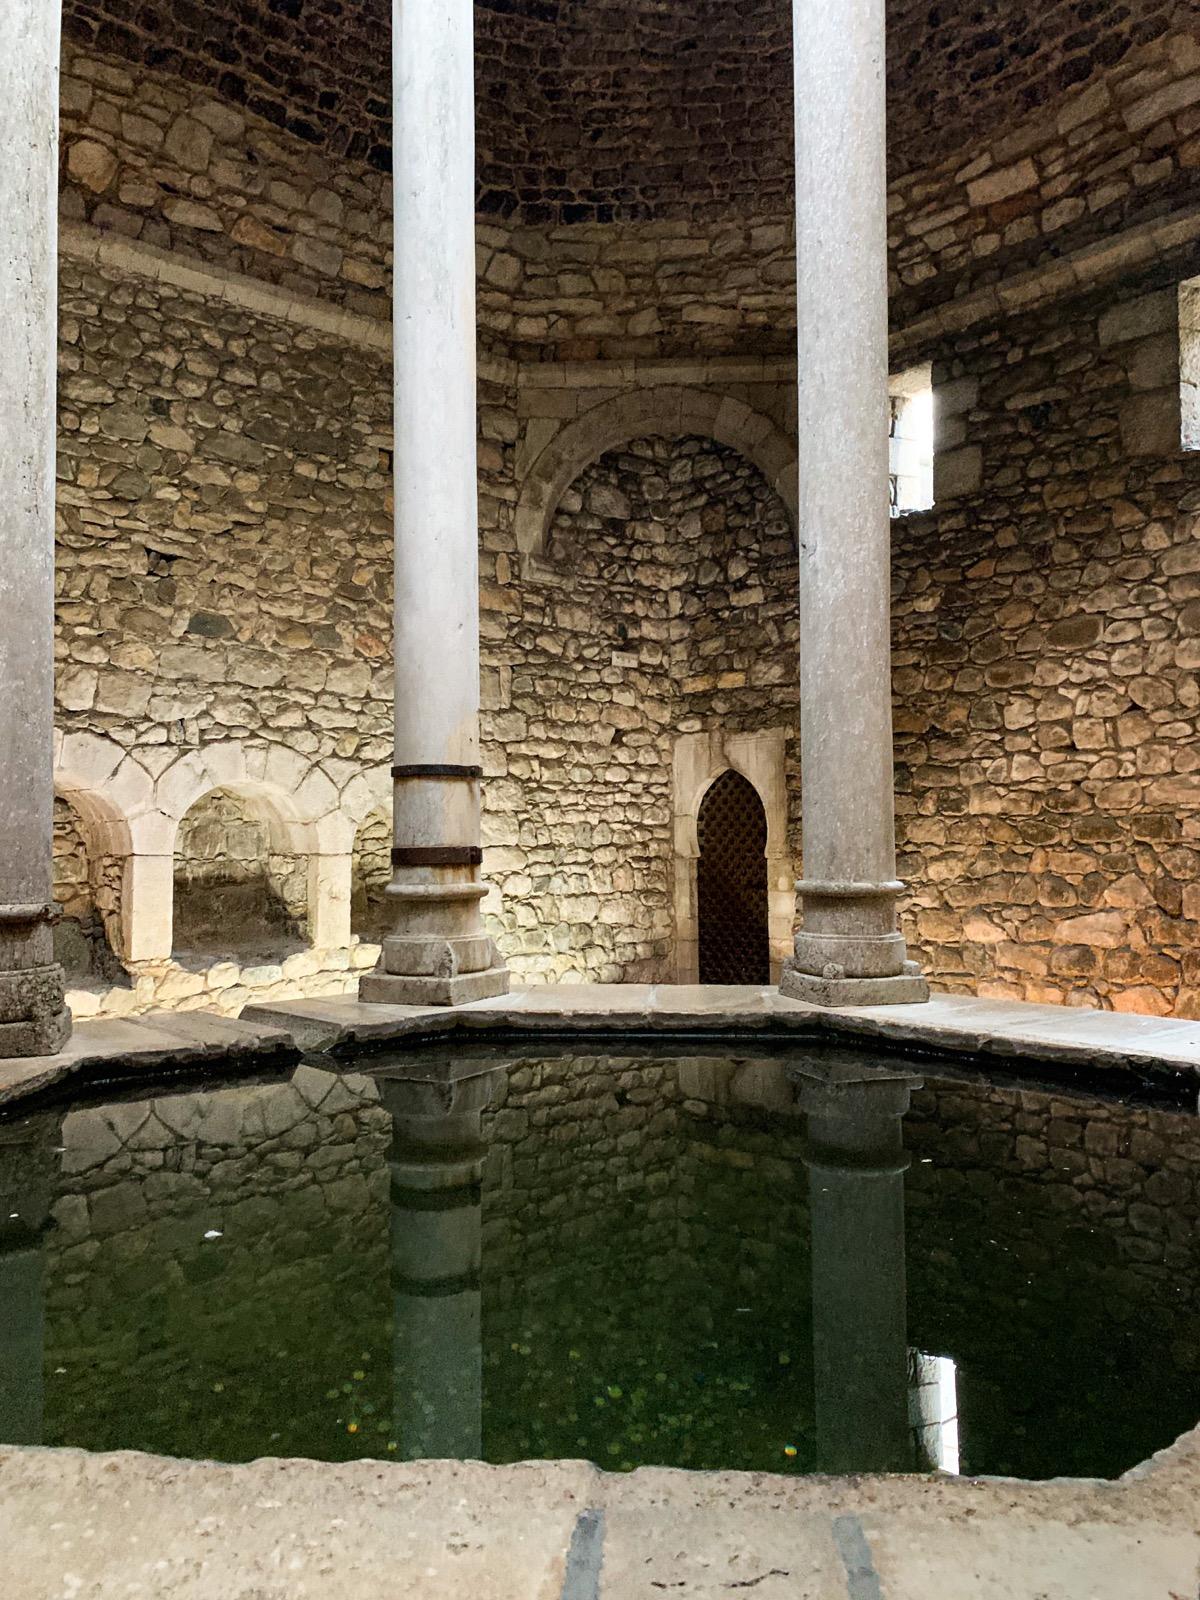 Girona: One Historic Day in Catalonia, Spain | Day Trips from Barcelona | A Great Big Hunk of World | www.agreatbighunkofworld.com |  Arab Baths